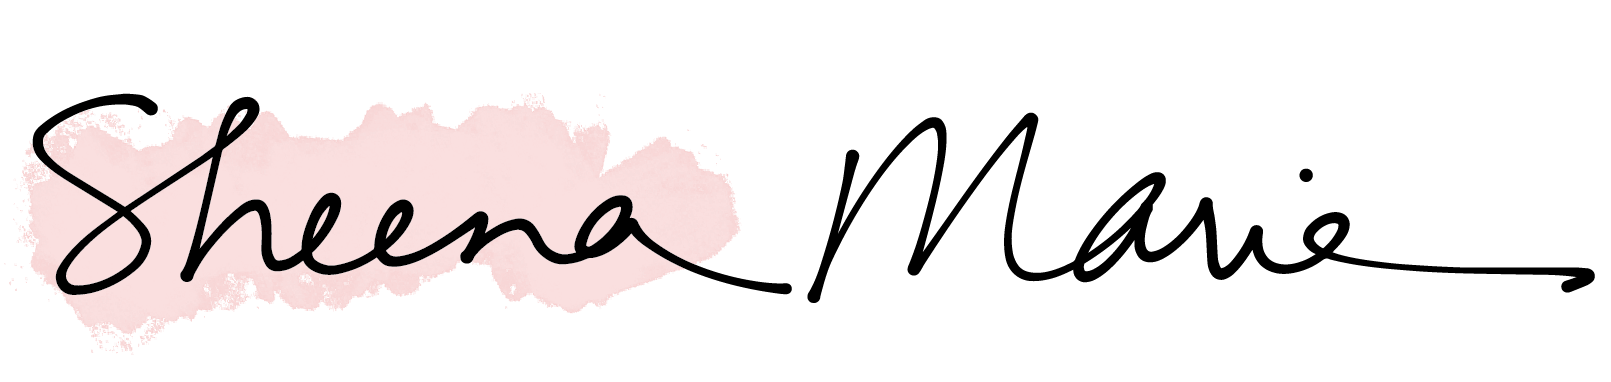 simplysheenamarie logo